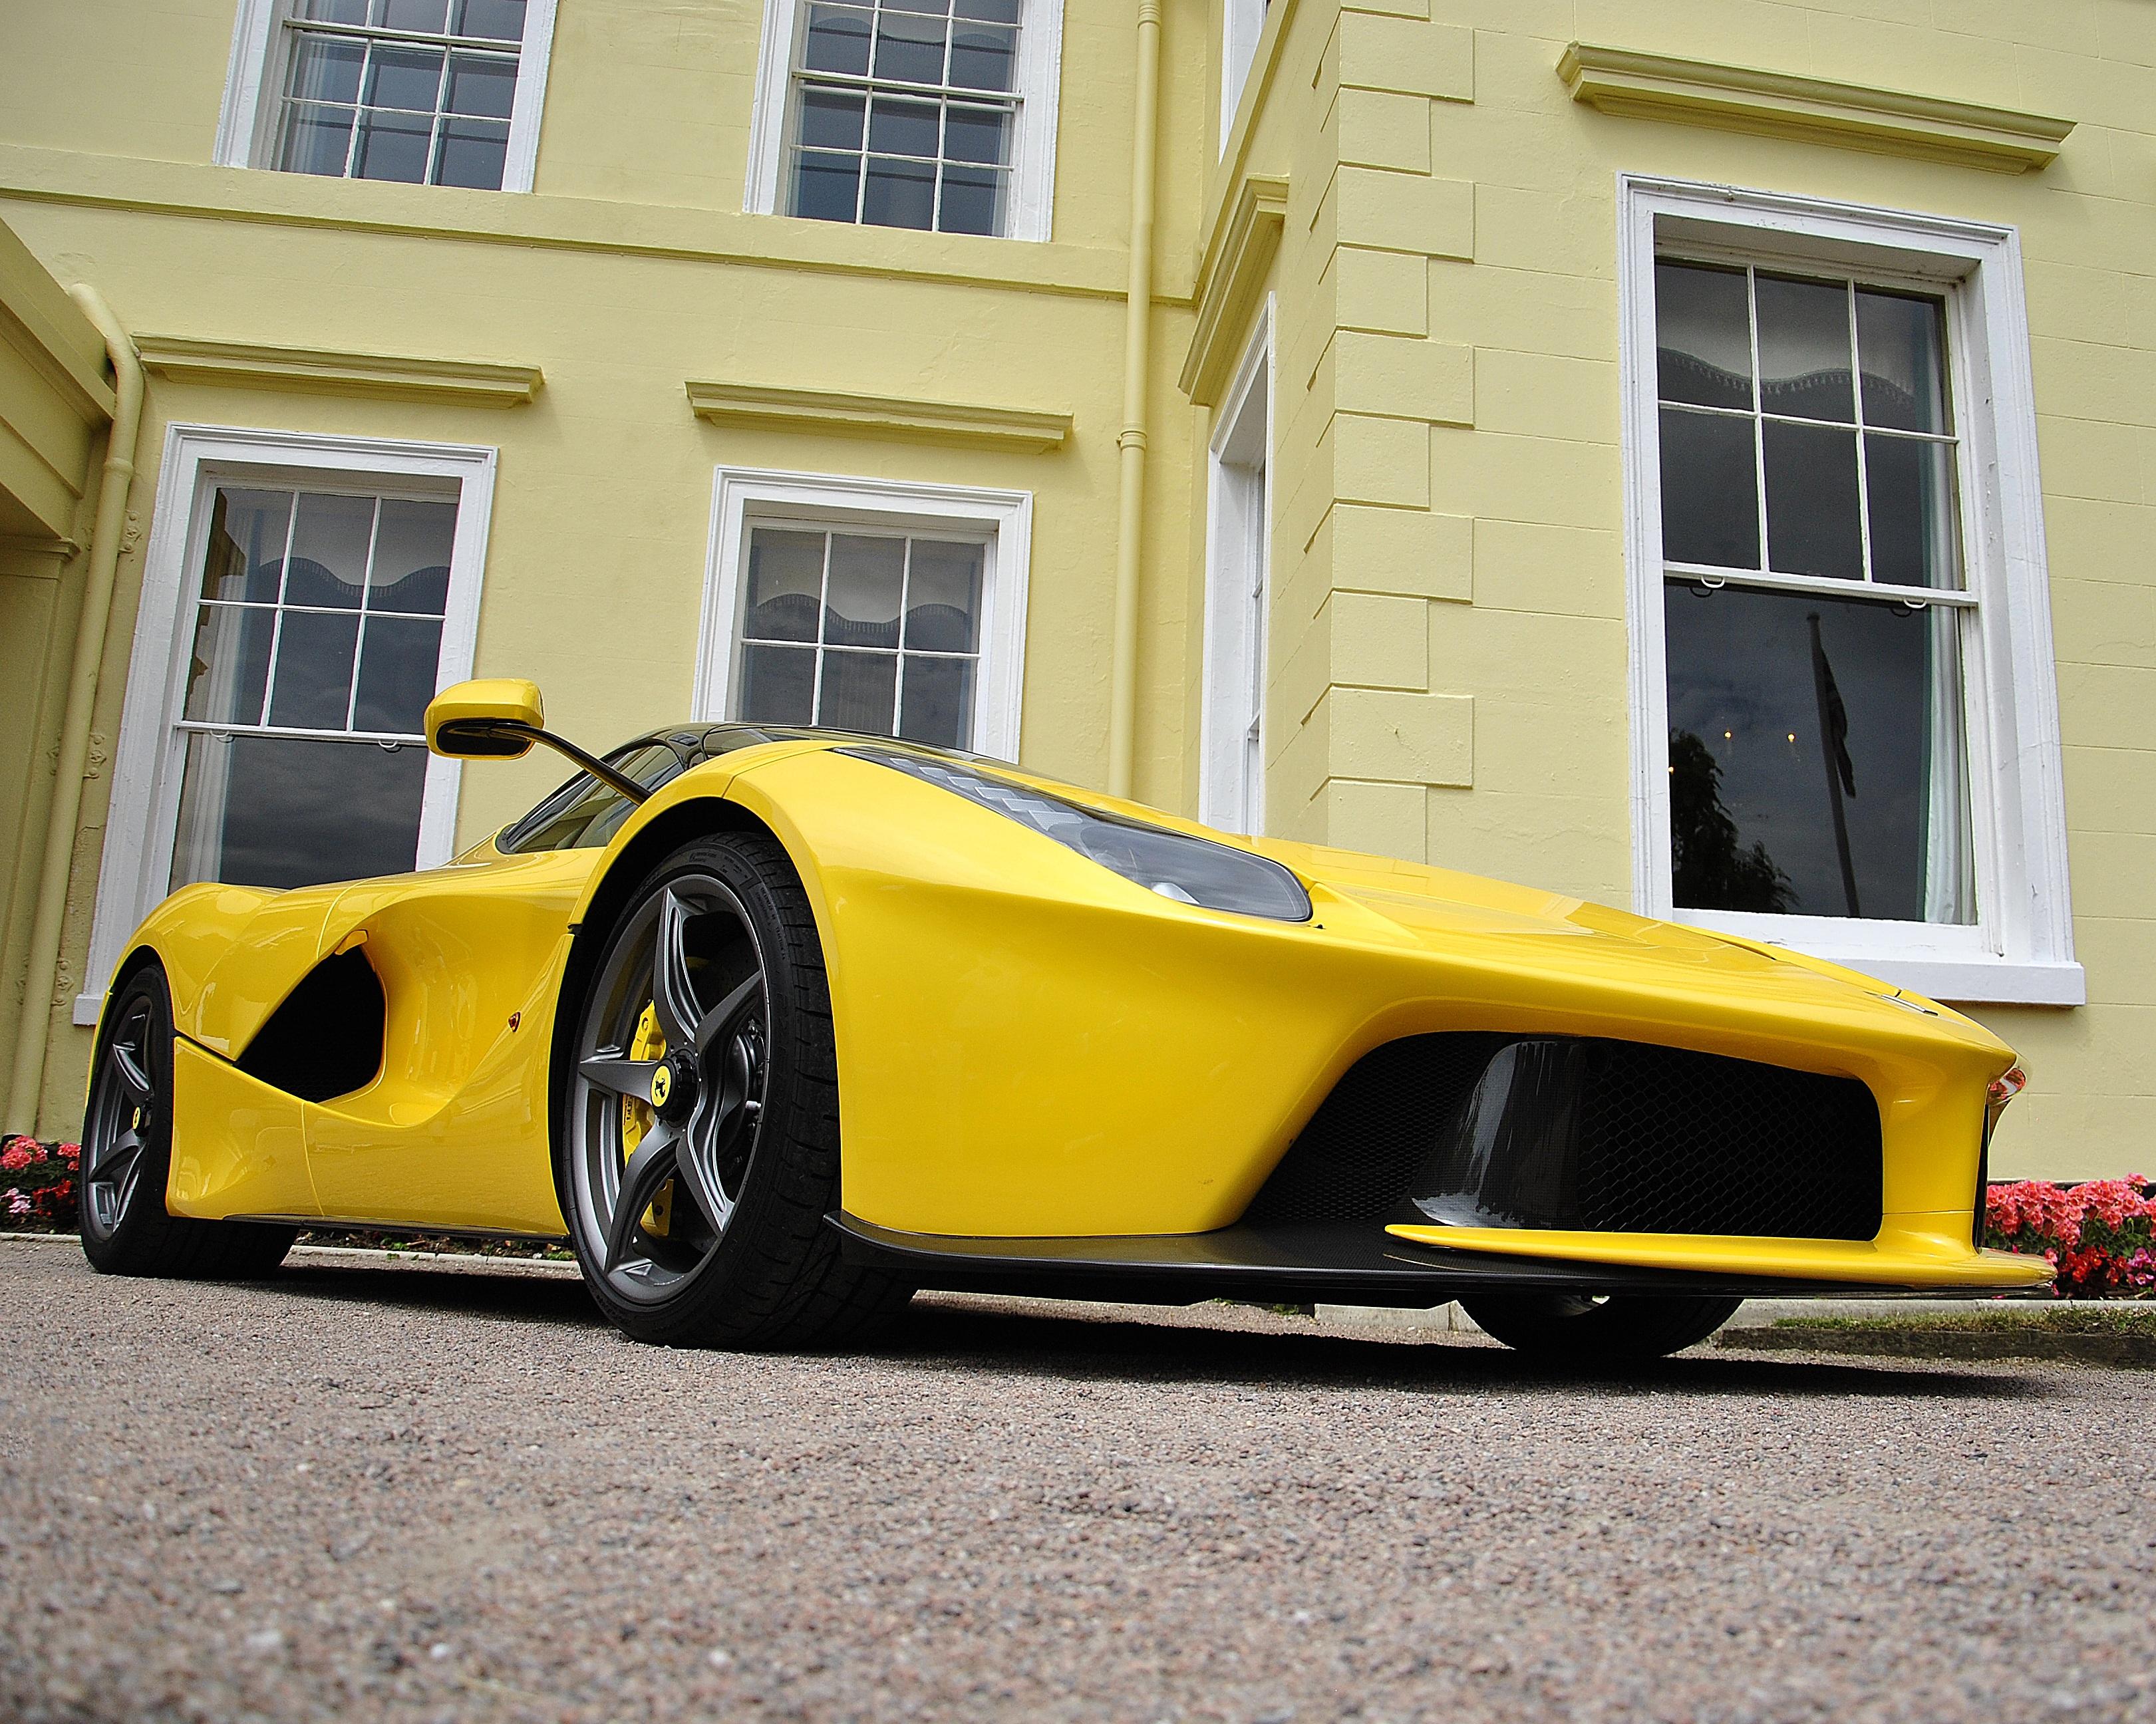 Free wheel sports car bumper supercar style ferrari